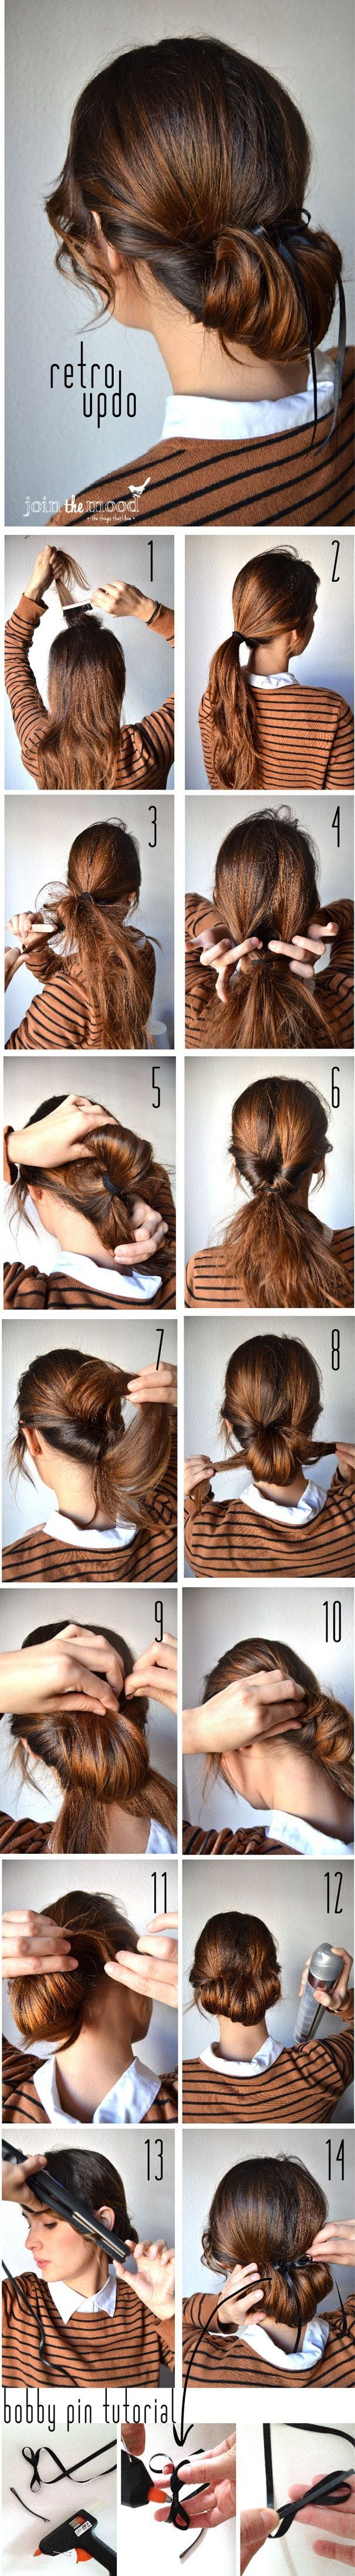 Astounding 14 Easy Step By Step Updo Hairstyles Tutorials Pretty Designs Short Hairstyles Gunalazisus